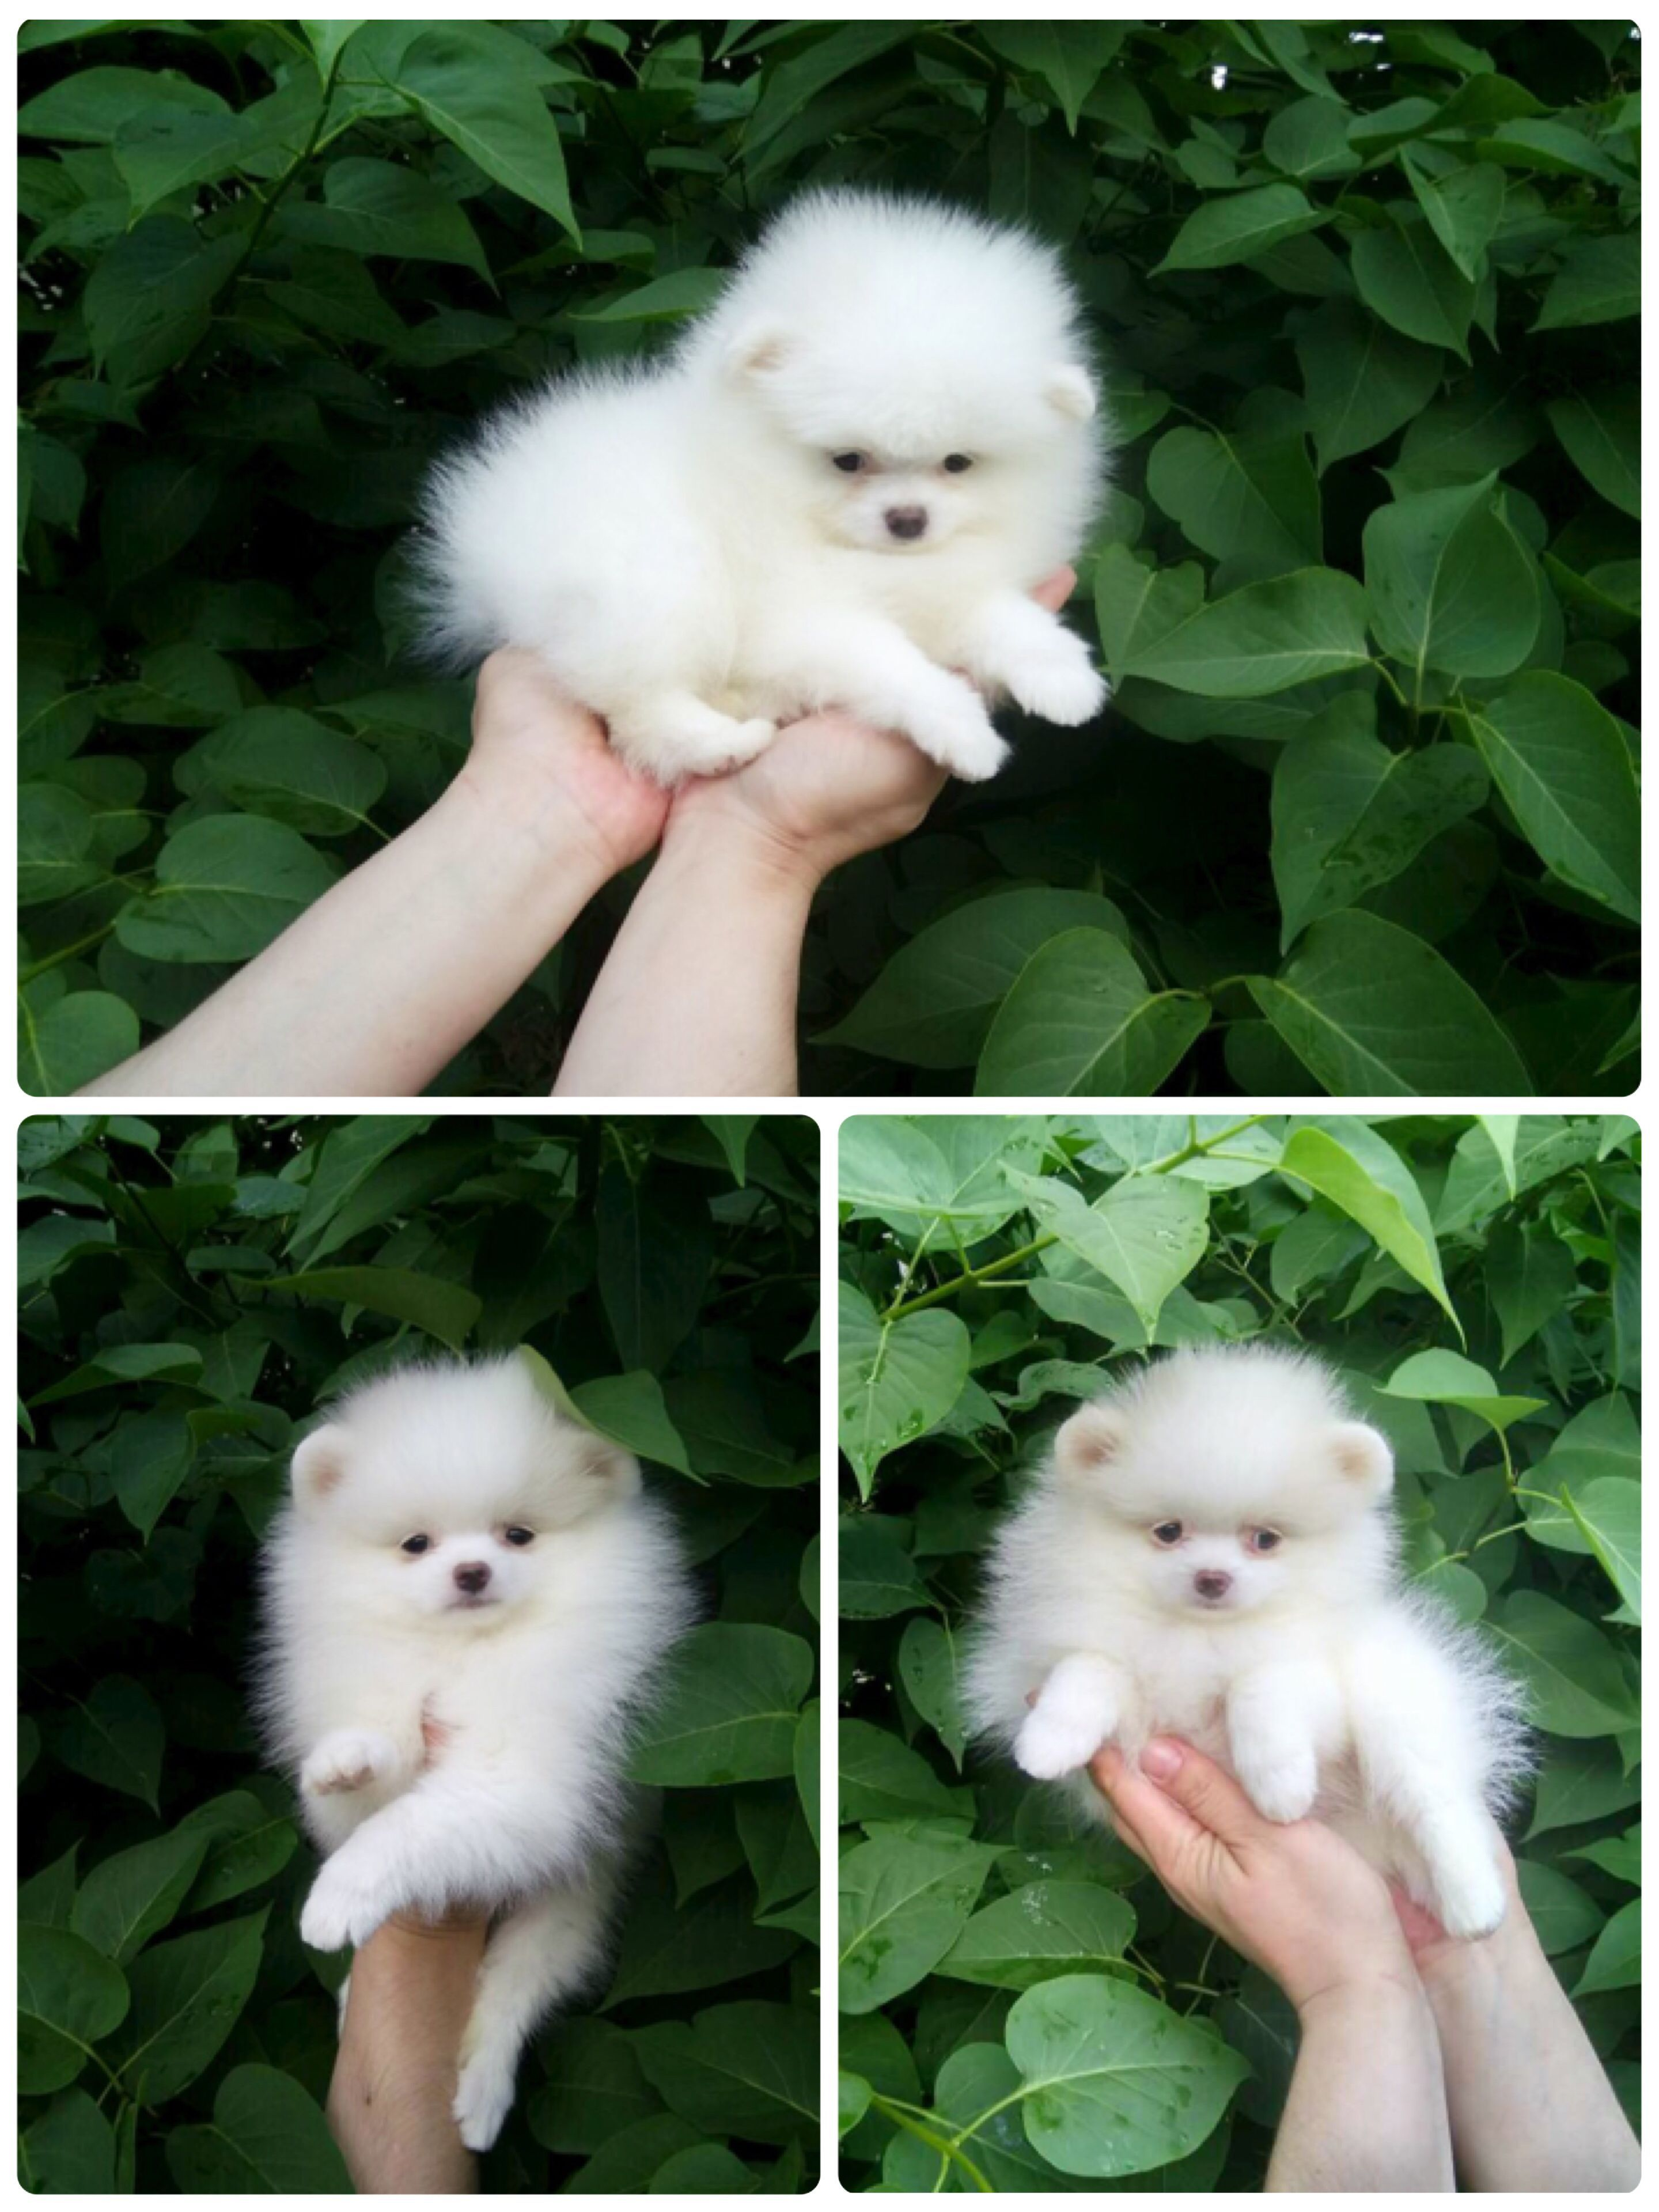 Spitzpomeranian Com 33 0 647023125 Femelle Blanche Cute Animals Beautiful Dogs Cute Dogs